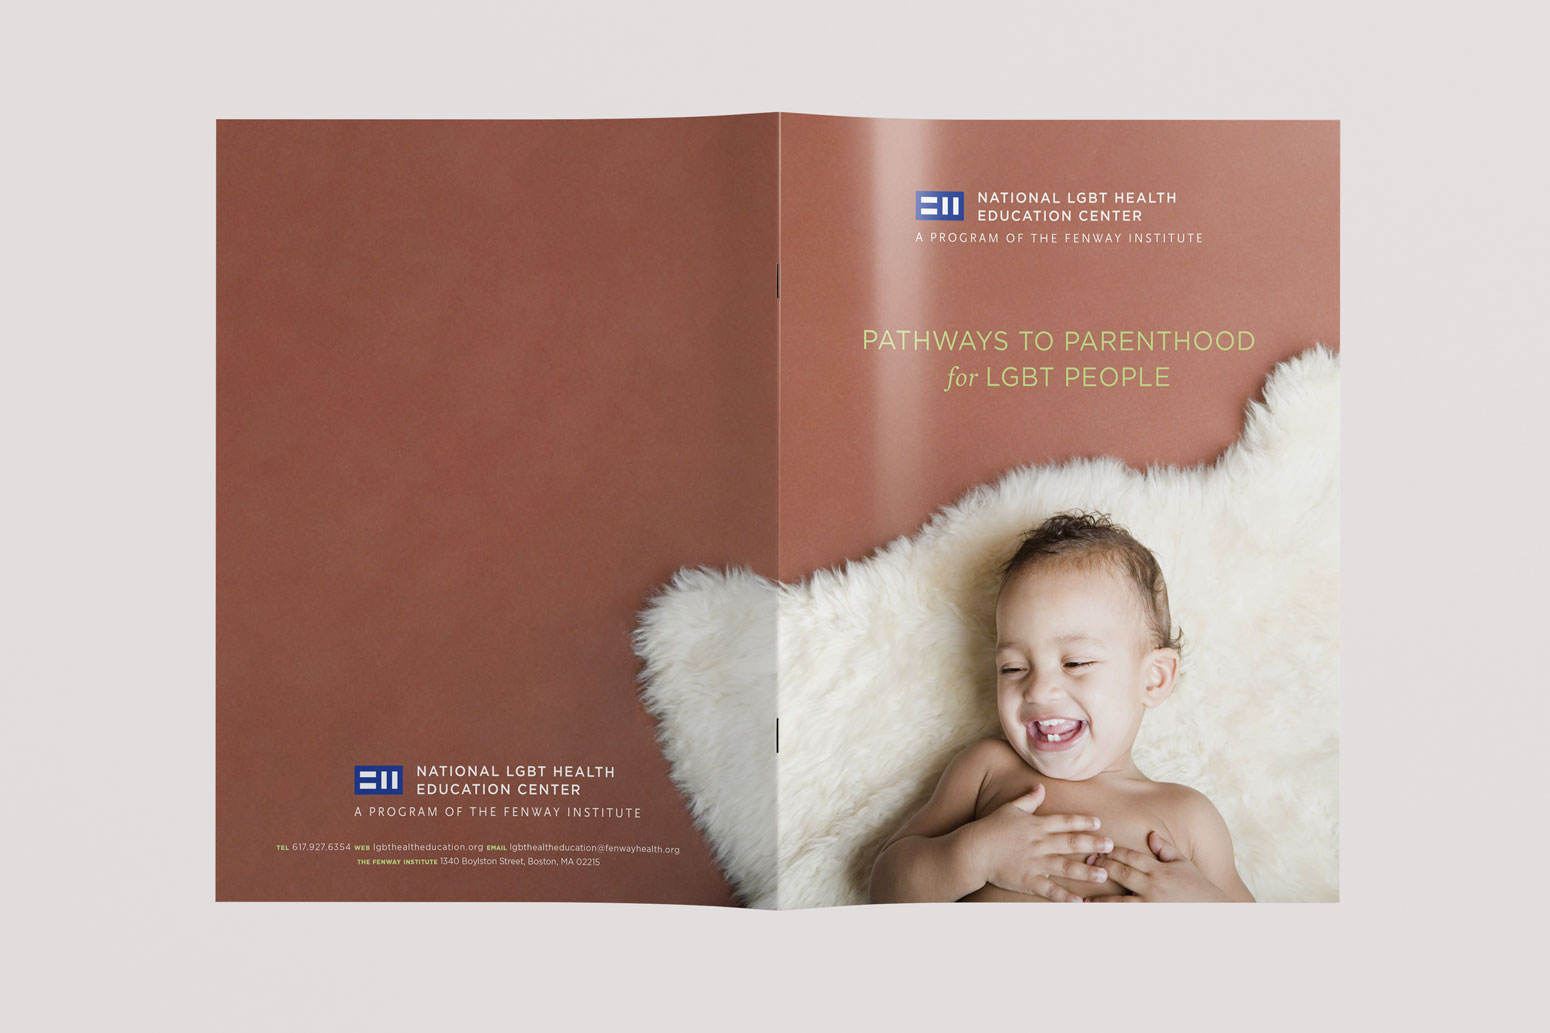 Pathways to Parenthood